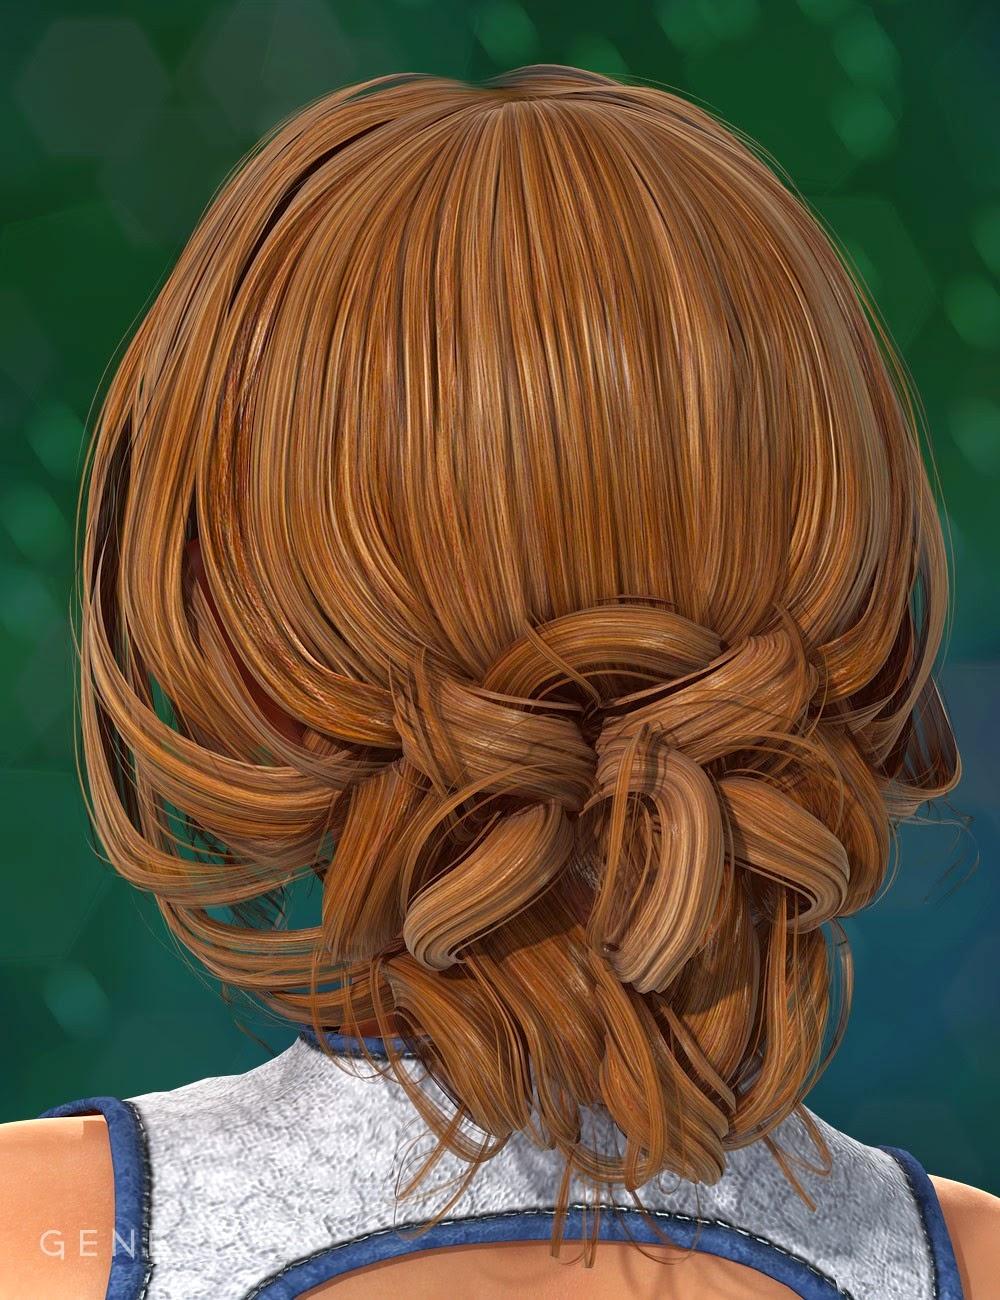 Kita cheveux pour Genesis 2 Femme